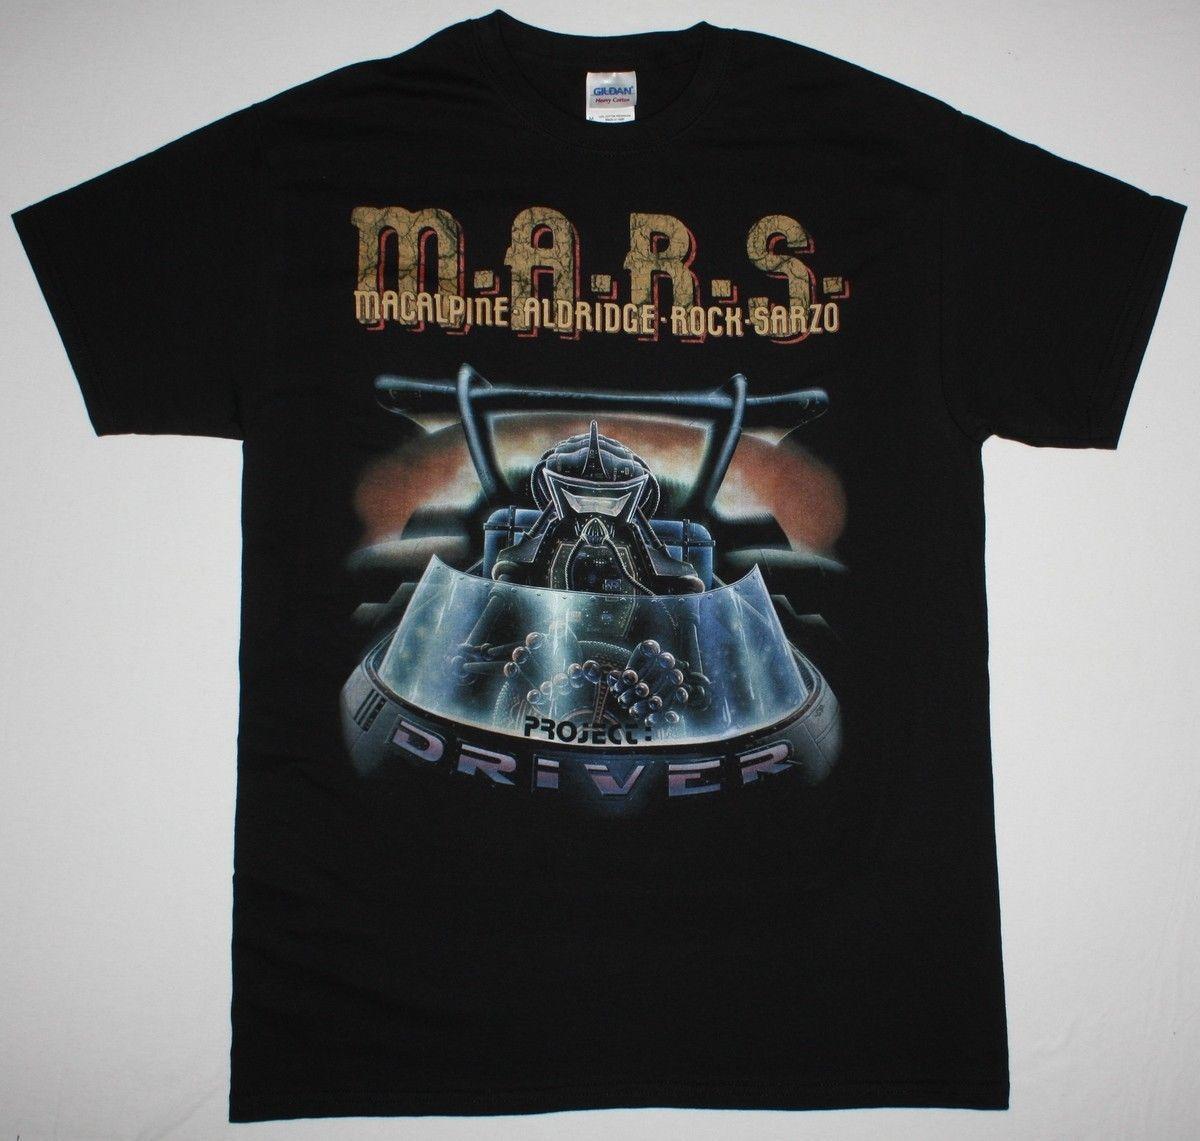 M.A.R.S. PROJECT DRIVER BLACK T SHIRT MARS BAND MACALPINE SARZO ALDRIDGE